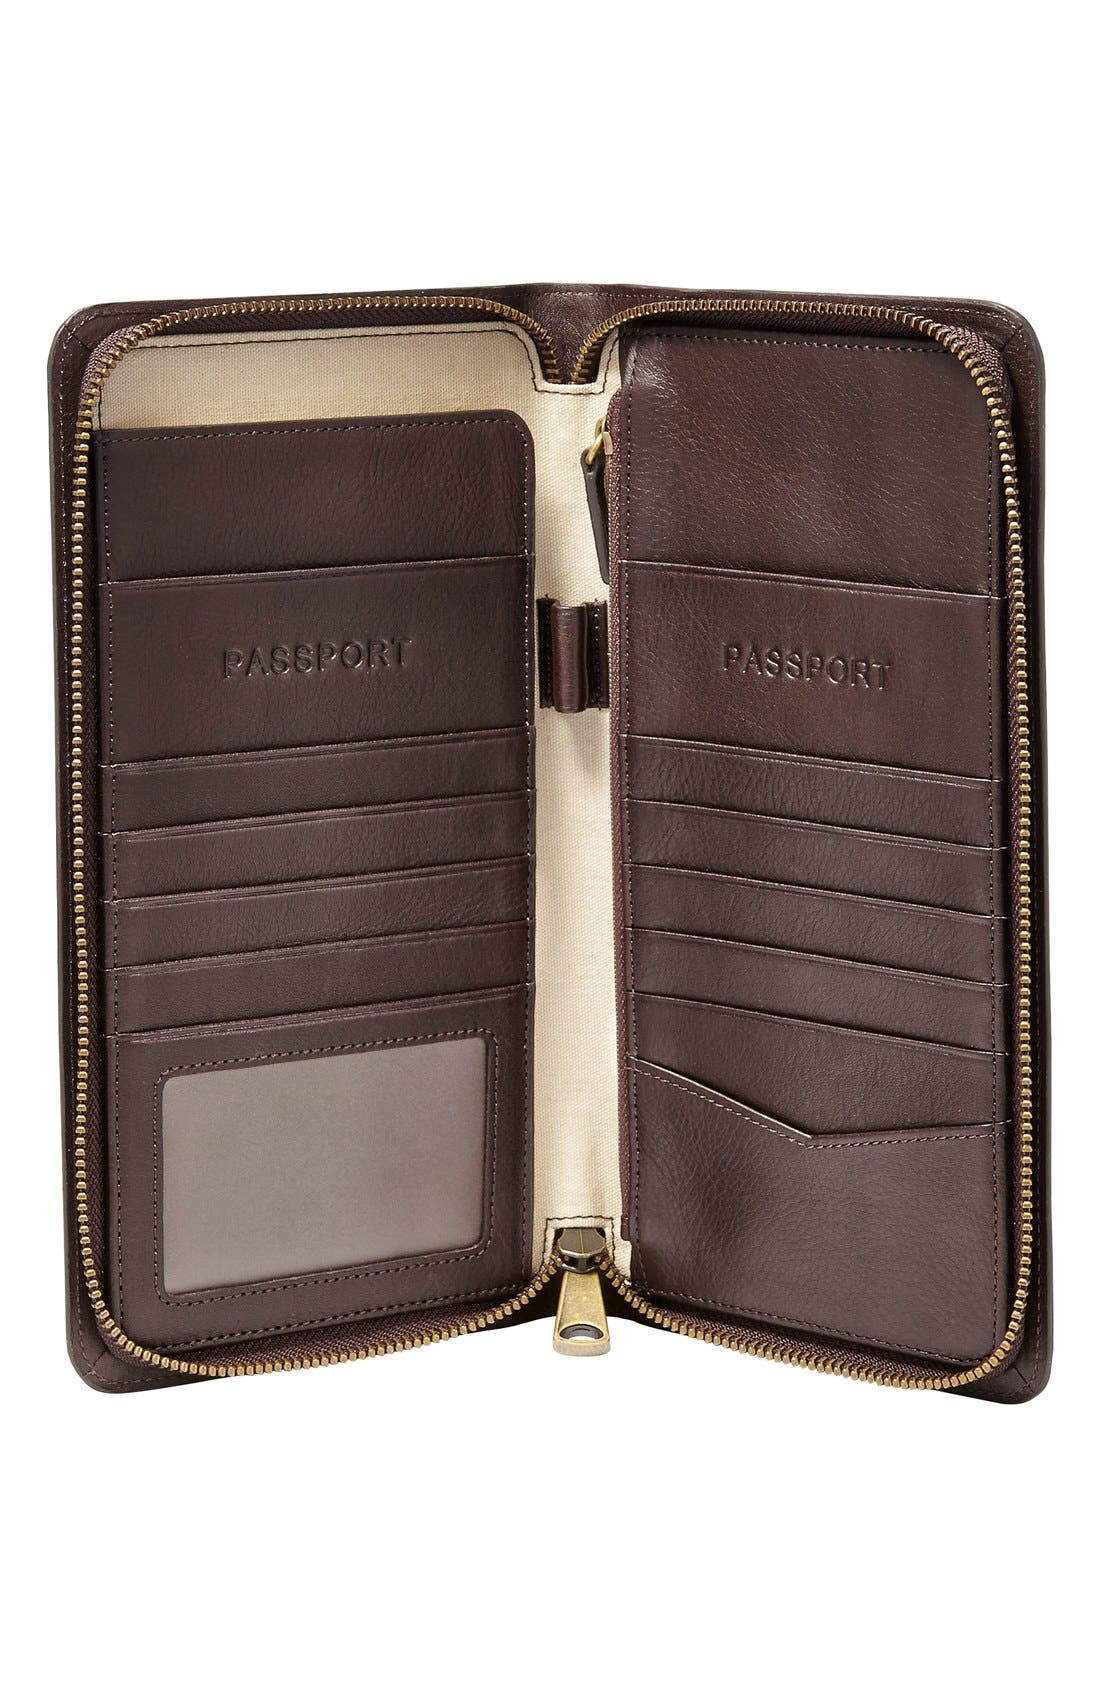 FOSSIL, Leather Zip Passport Case, Alternate thumbnail 2, color, 201